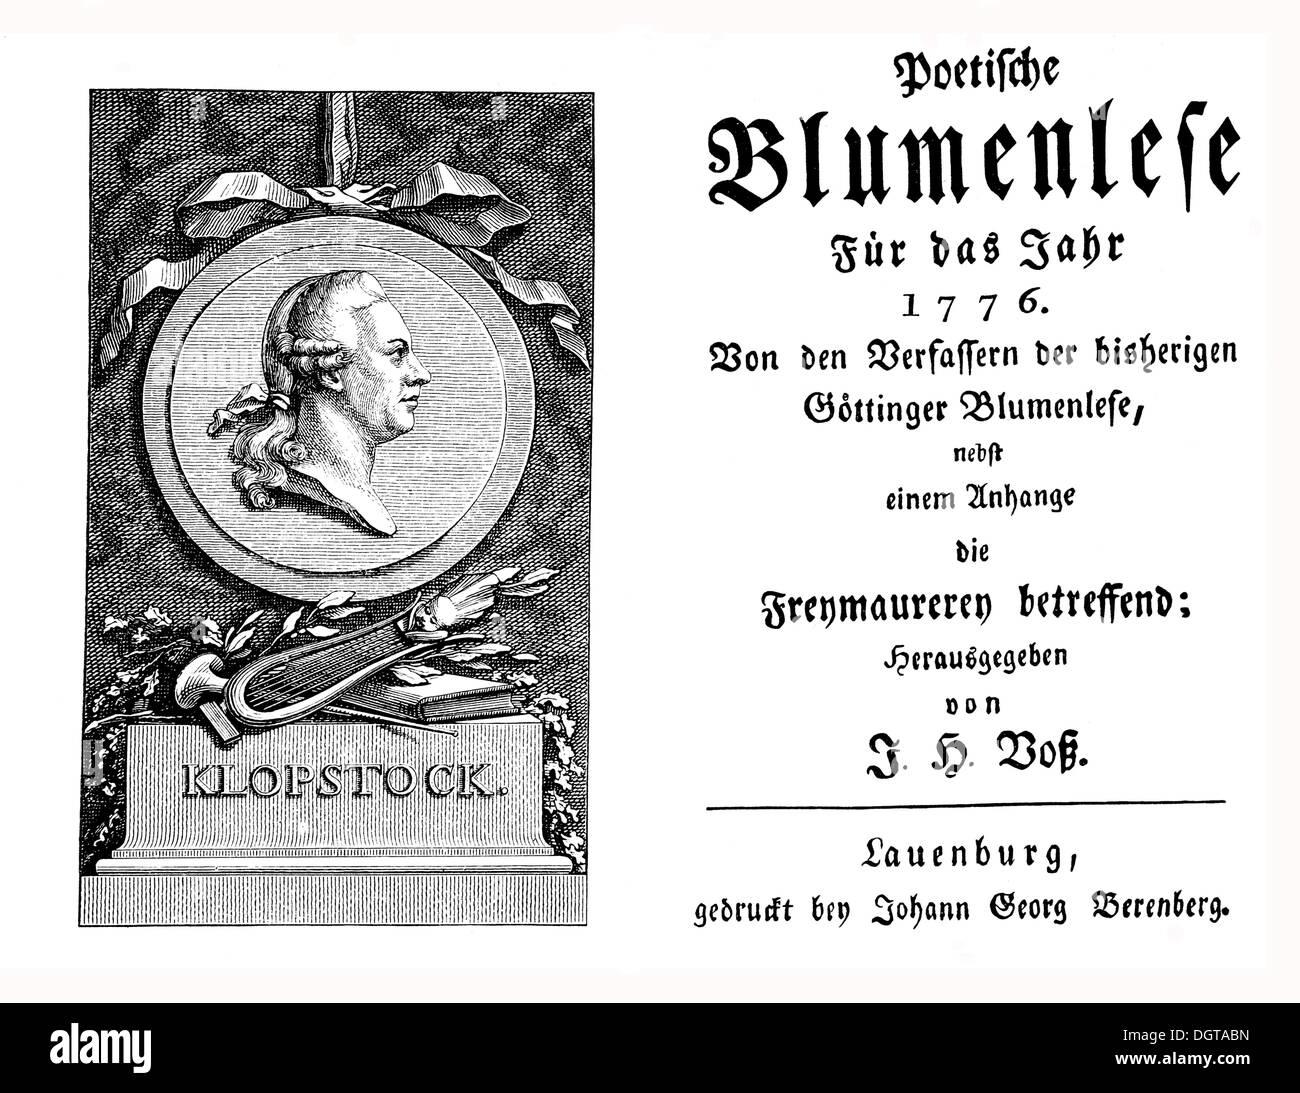 Frontispiece and cover of the Vossische Musenalmanachs almanac for 1776, historic depiction in Deutsche Literaturgeschichte - Stock Image